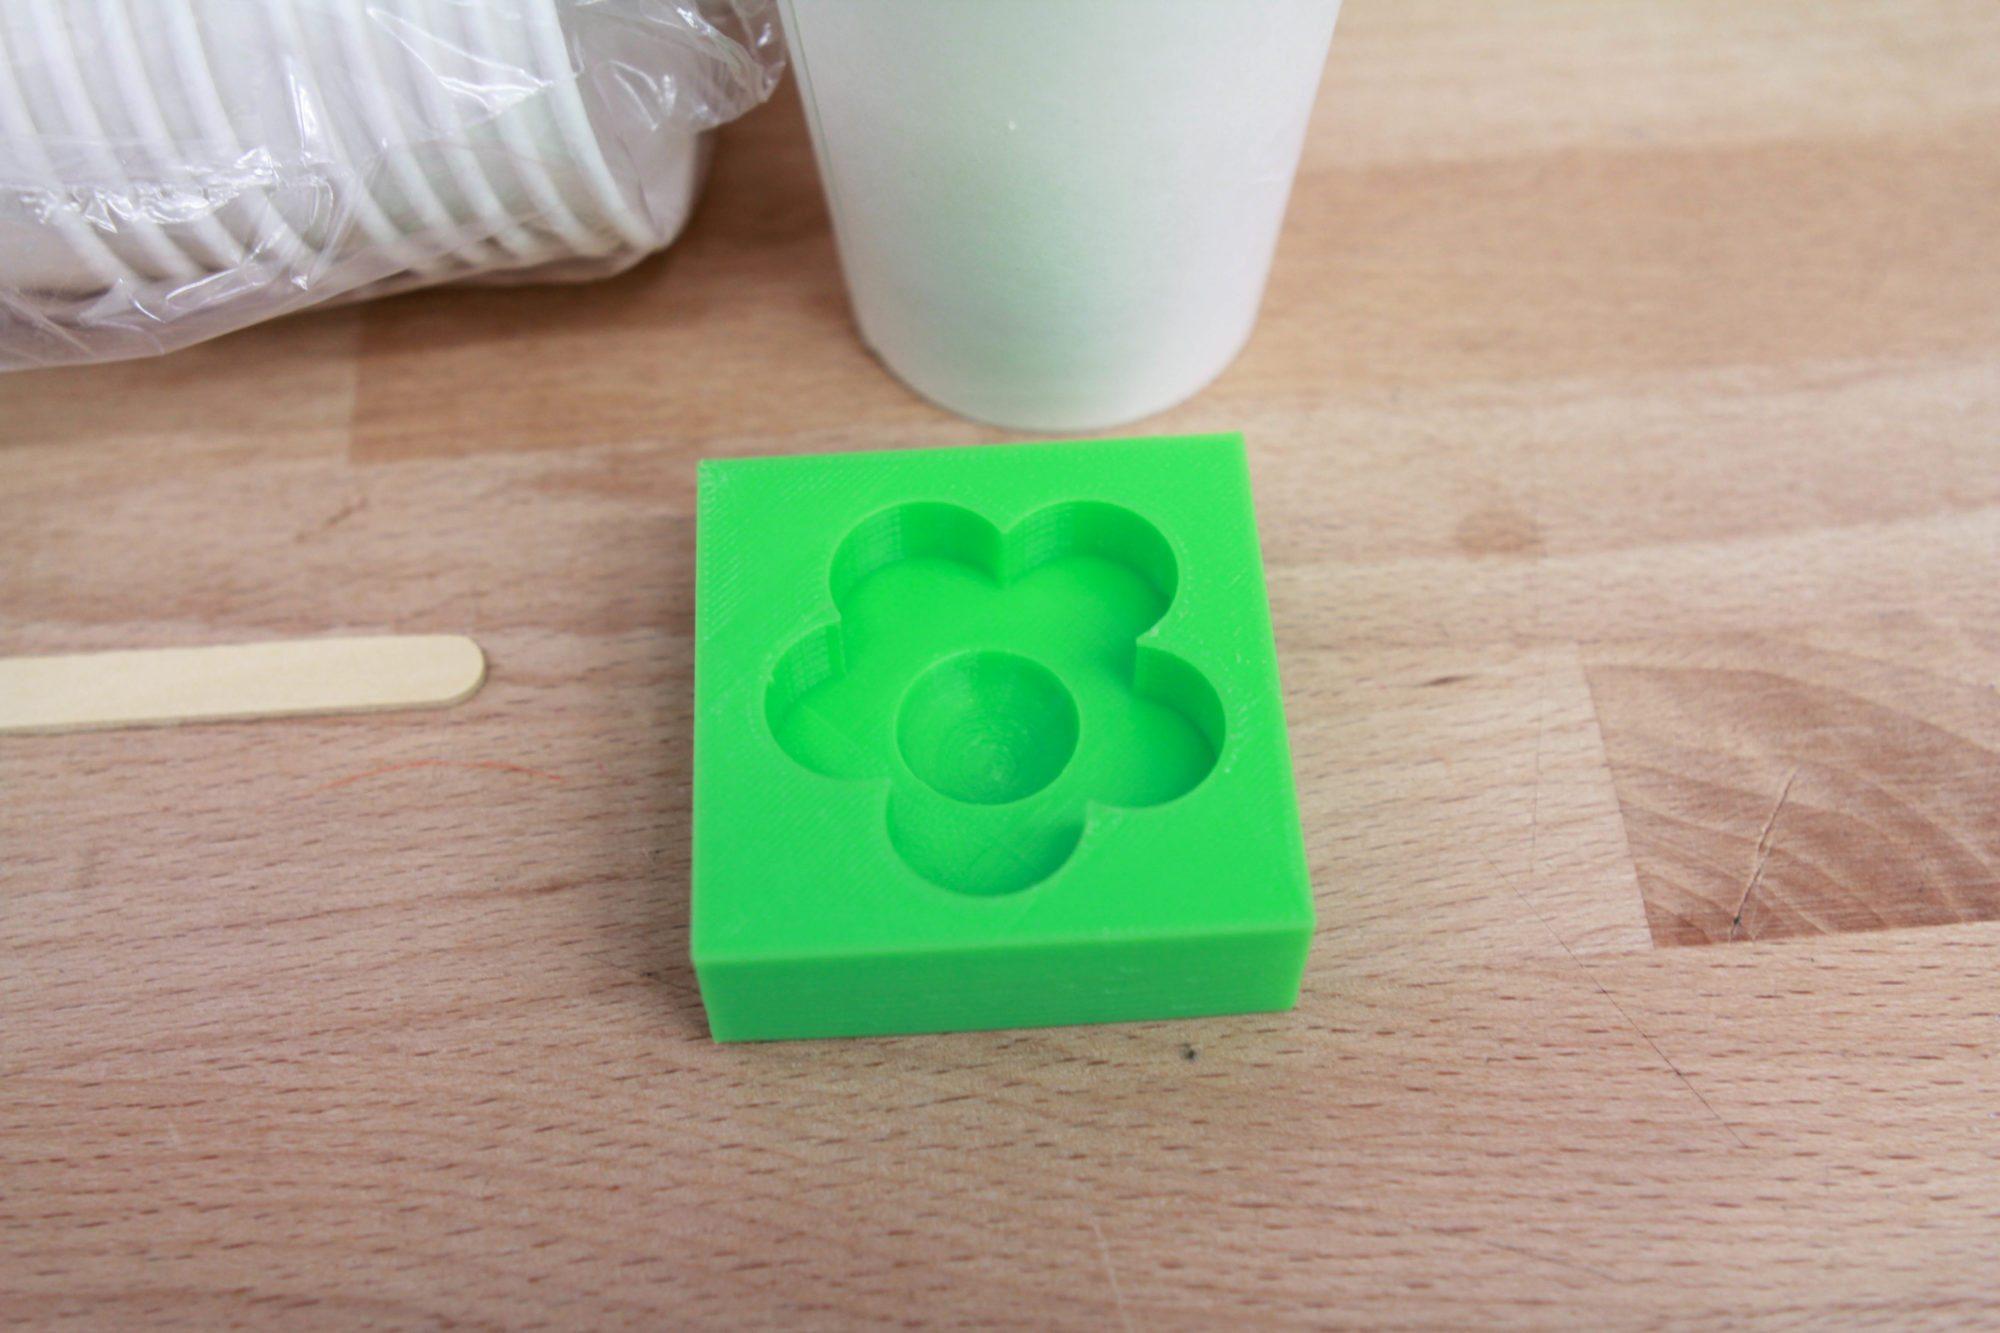 Pt 2 Step 10 - Clean mold